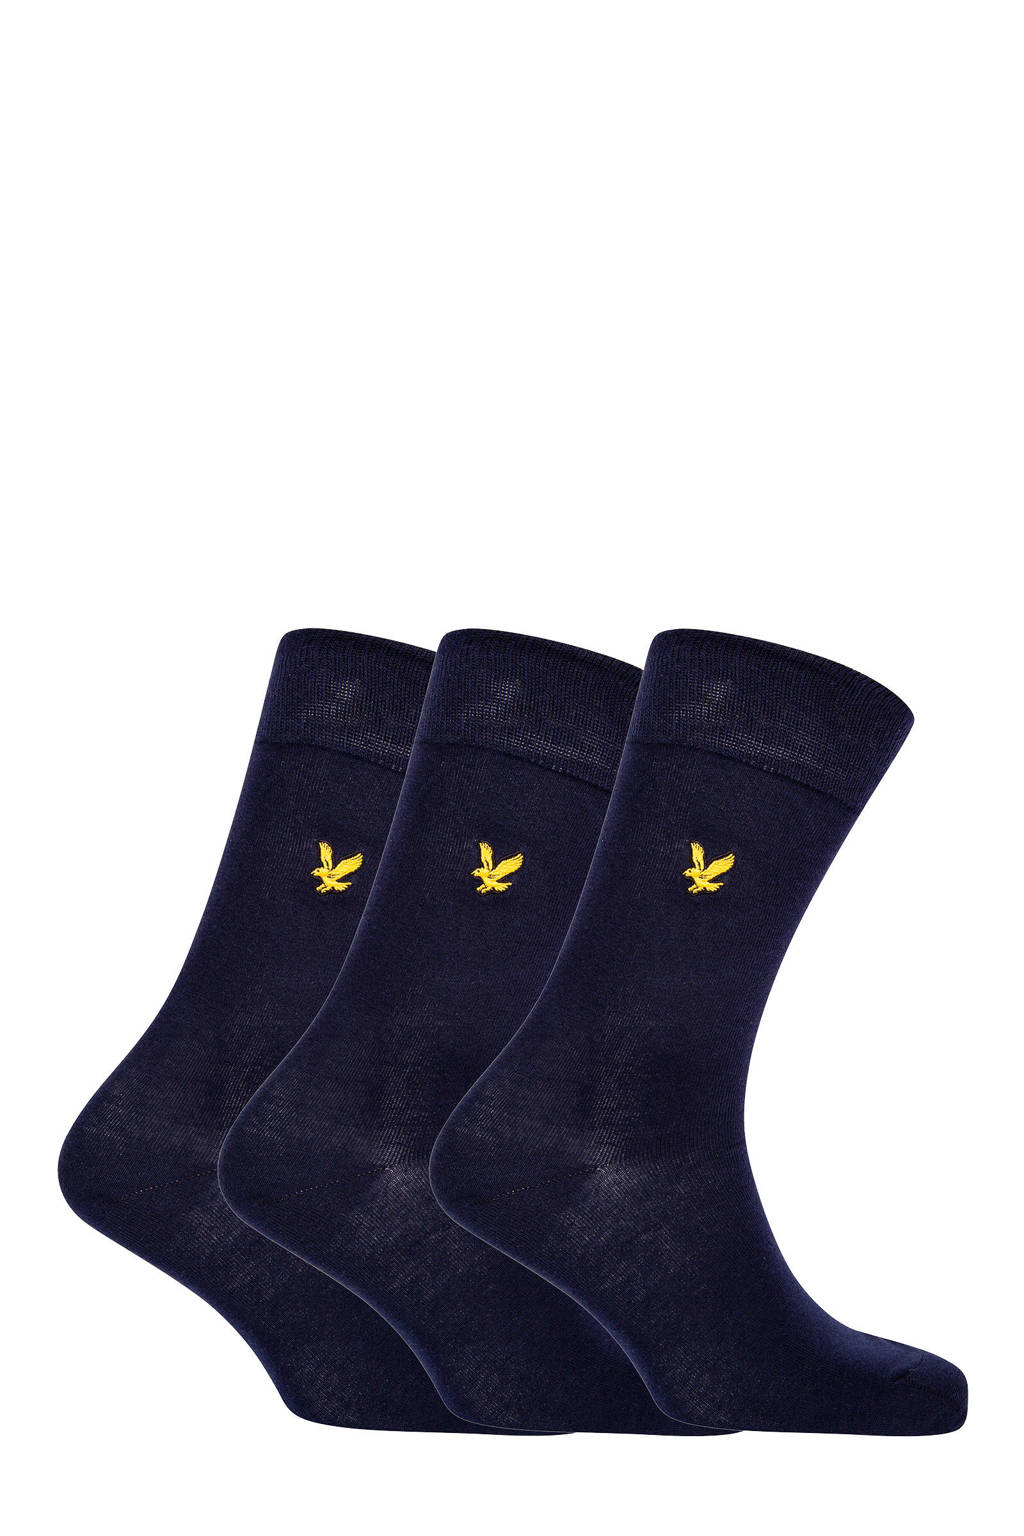 Lyle & Scott sokken Angus - set van 3 donkerblauw, Donkerblauw